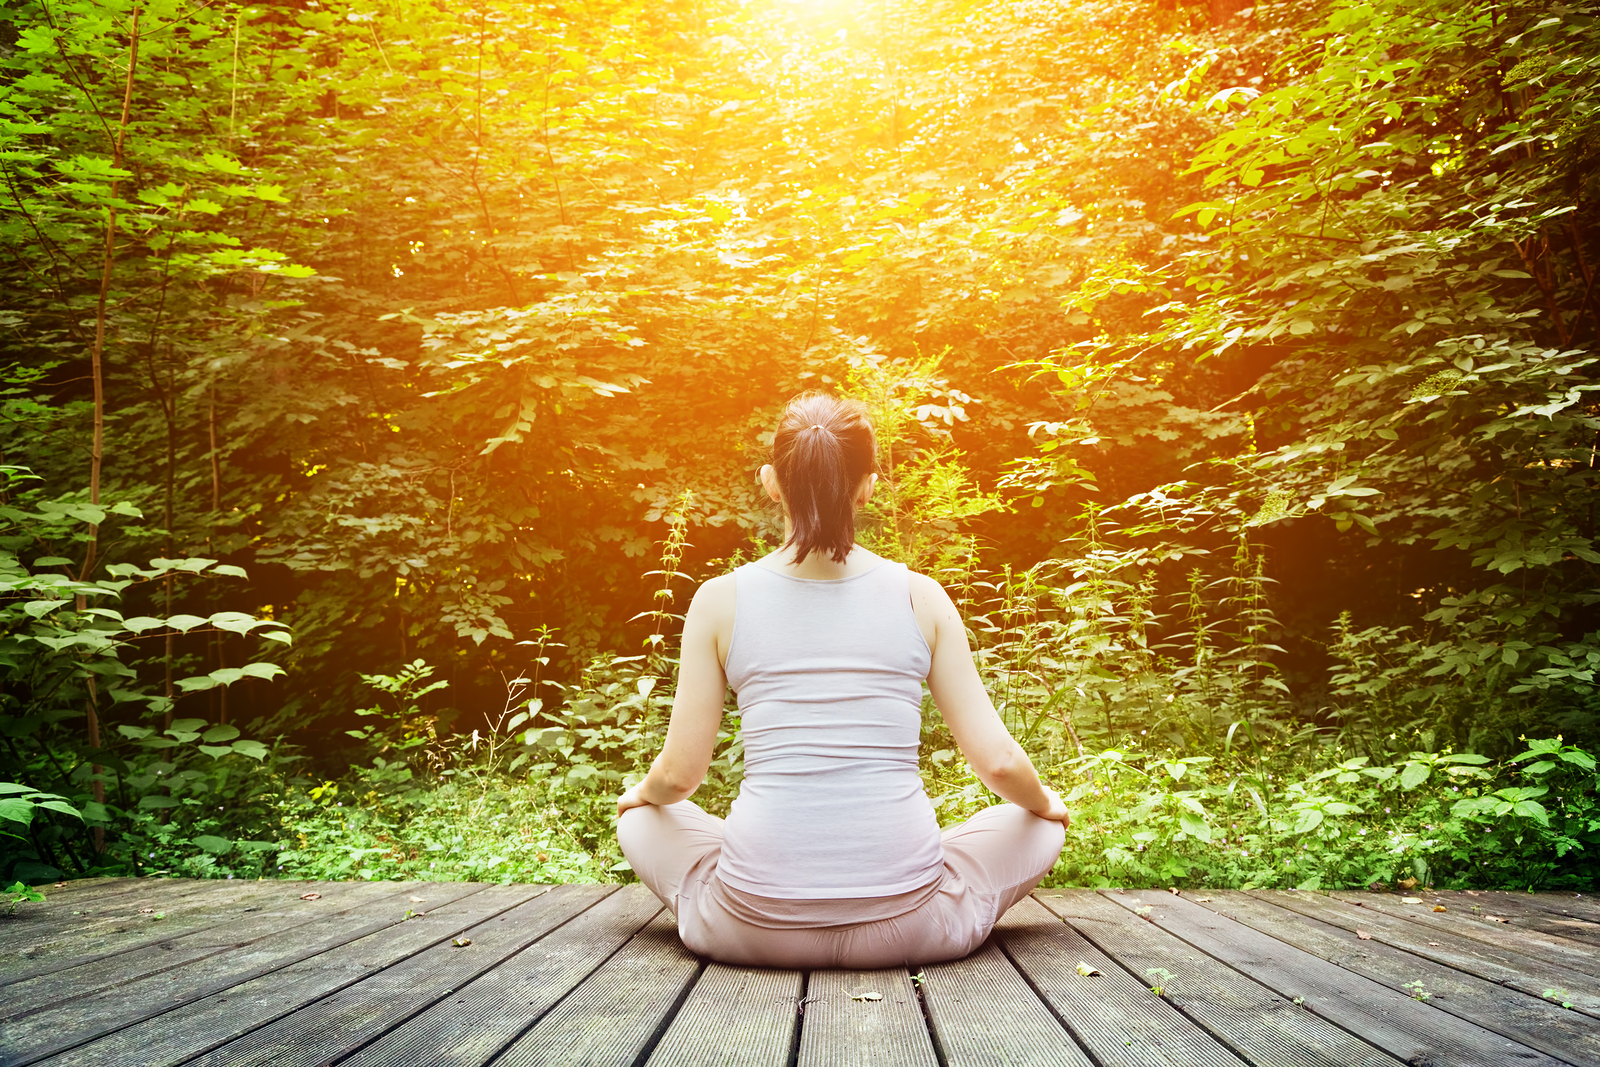 bigstock-Young-woman-meditating-in-a-fo-68759434.jpg